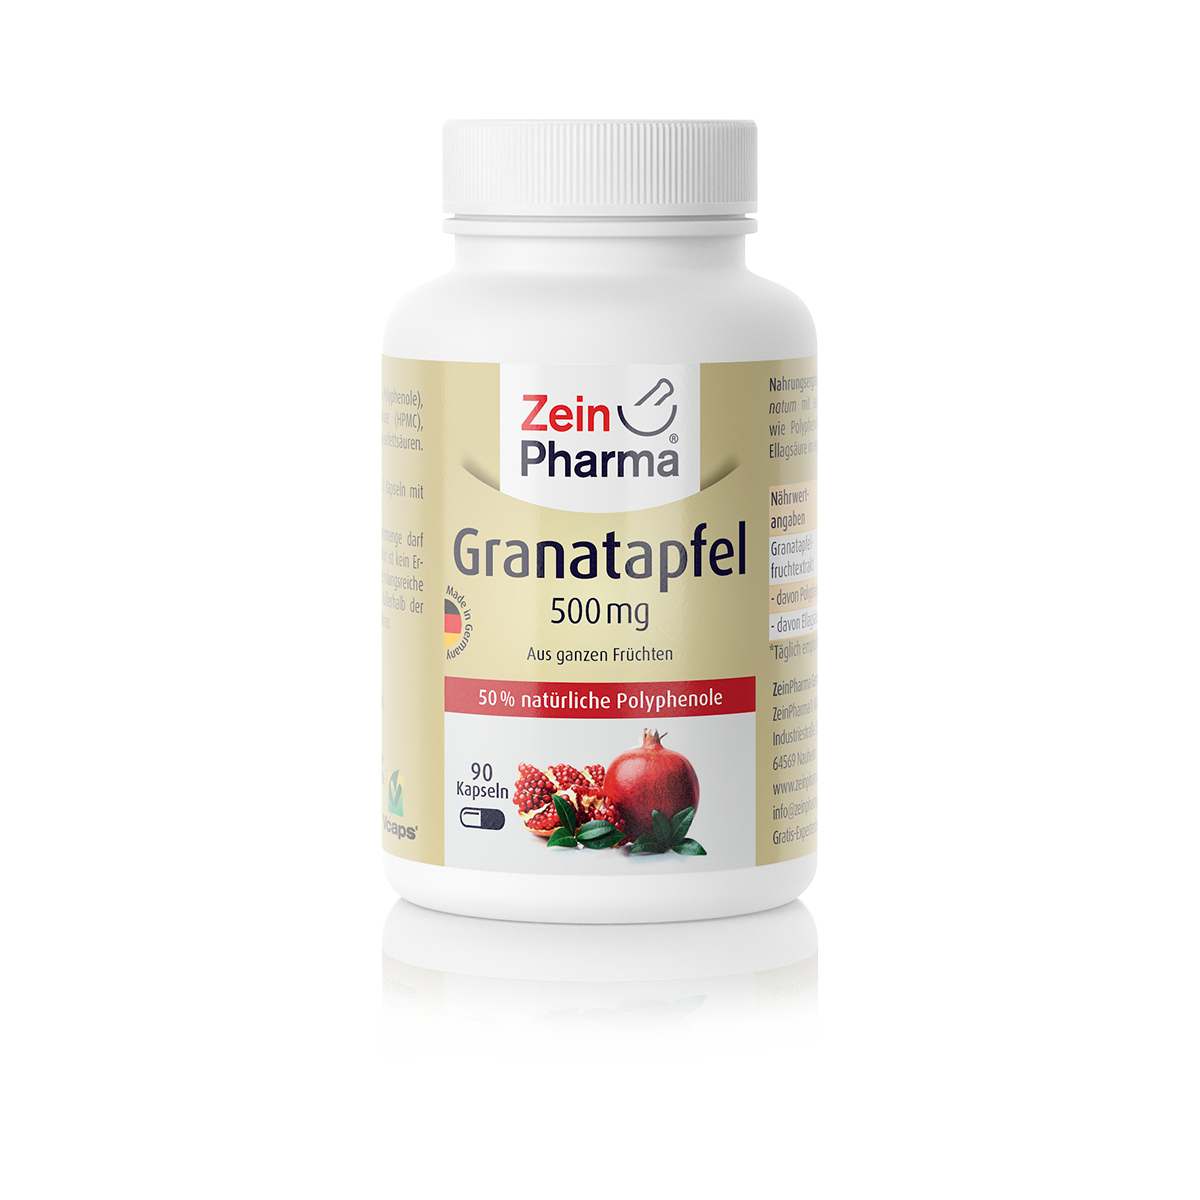 Zeinpharma Granatapfel Extrakt 500 mg Kapseln